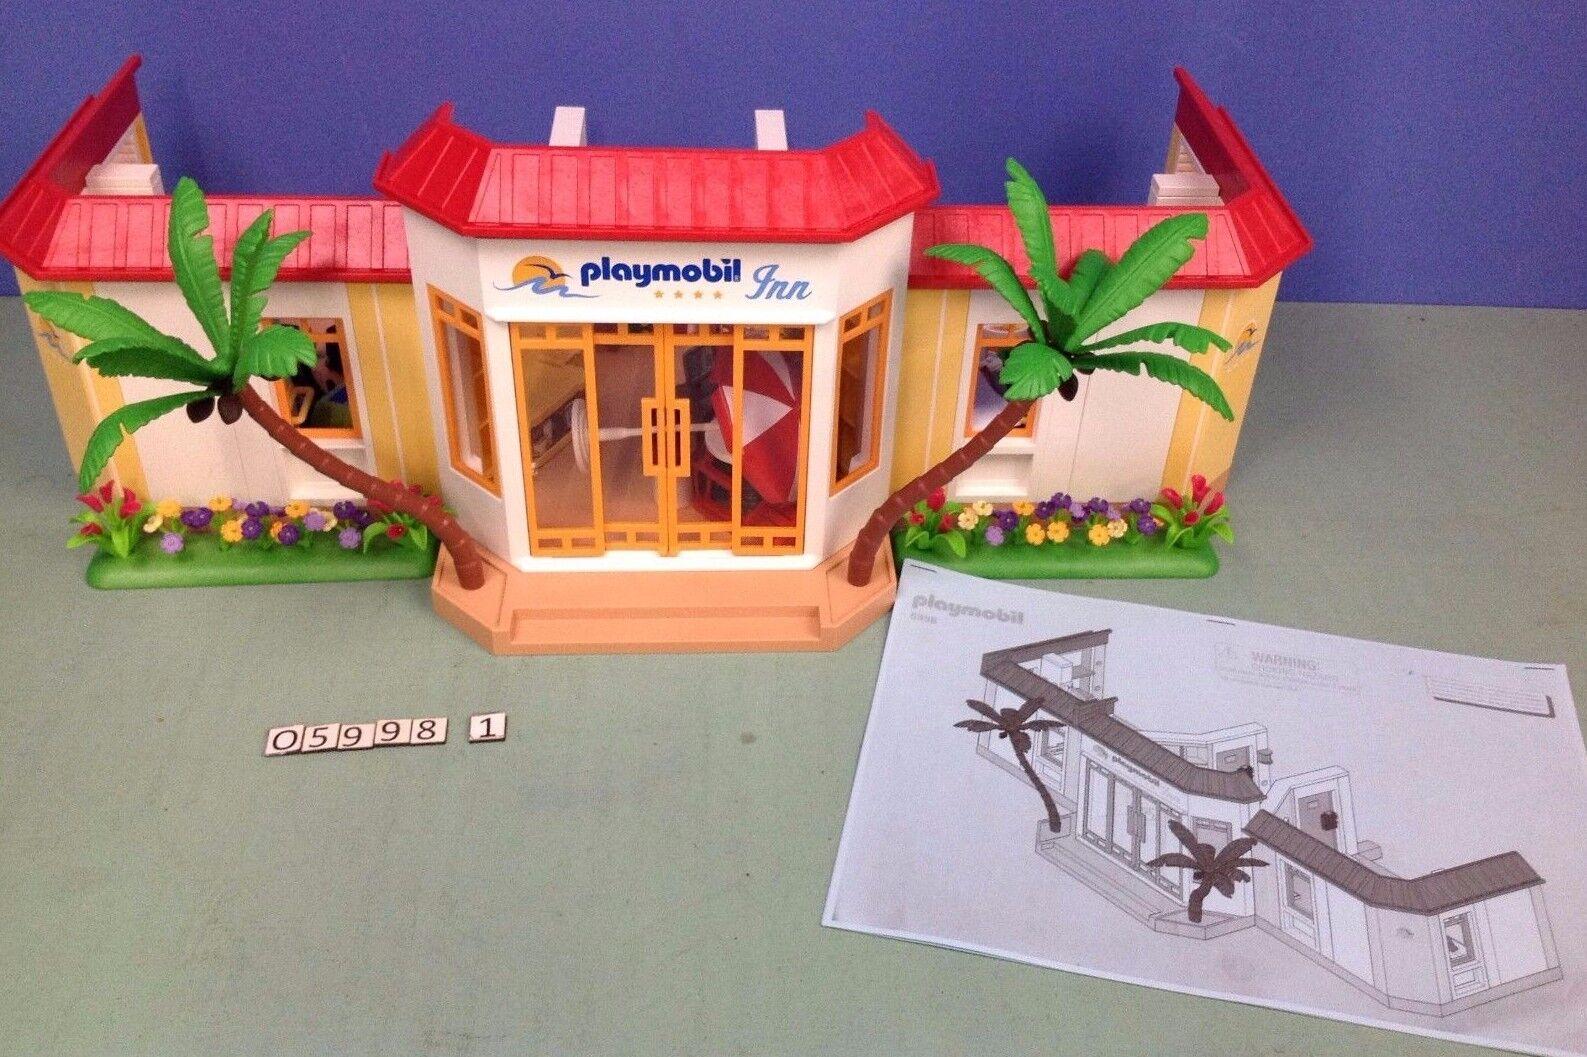 (O5998.1) playmobil Hôtel de la plage ref 5998 complet